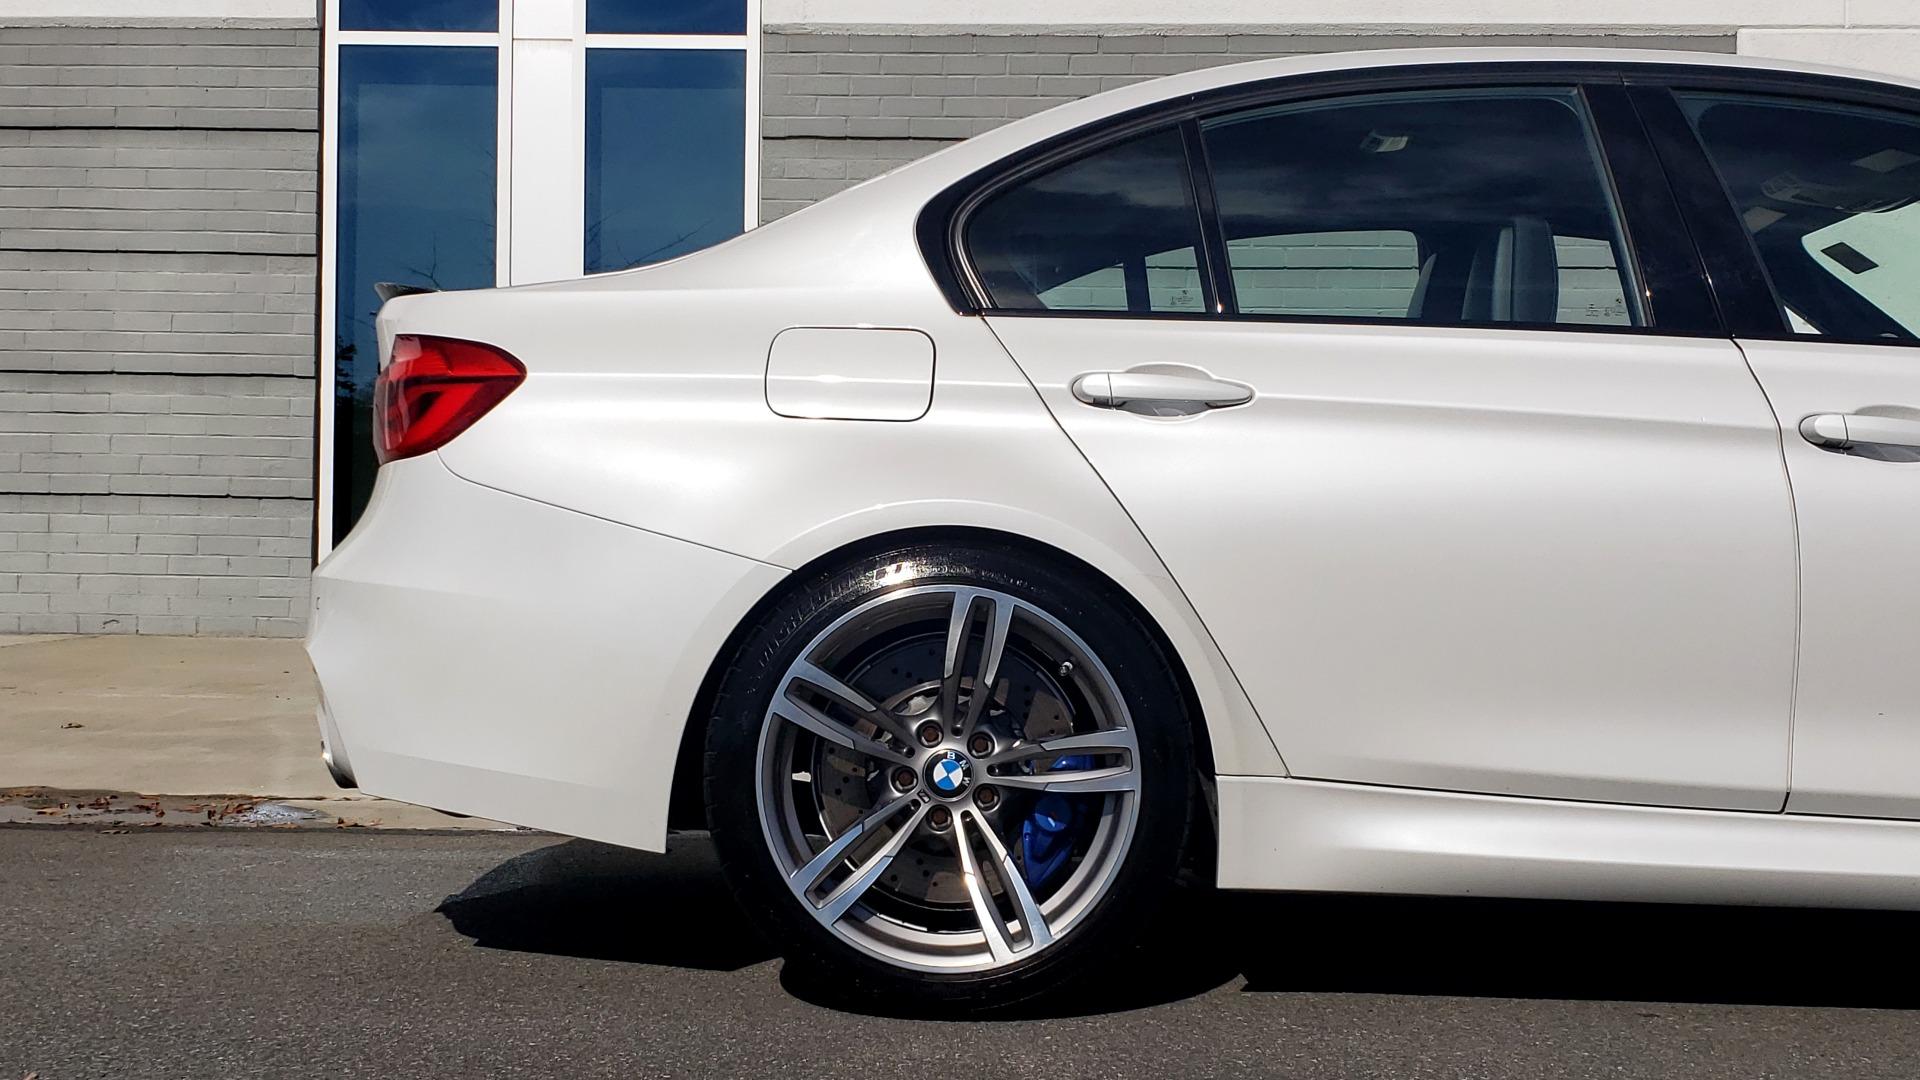 Used 2016 BMW M3 SEDAN / EXECUTIVE PKG / M-SUSPENSION / HARMAN/KARDON SOUND for sale Sold at Formula Imports in Charlotte NC 28227 80